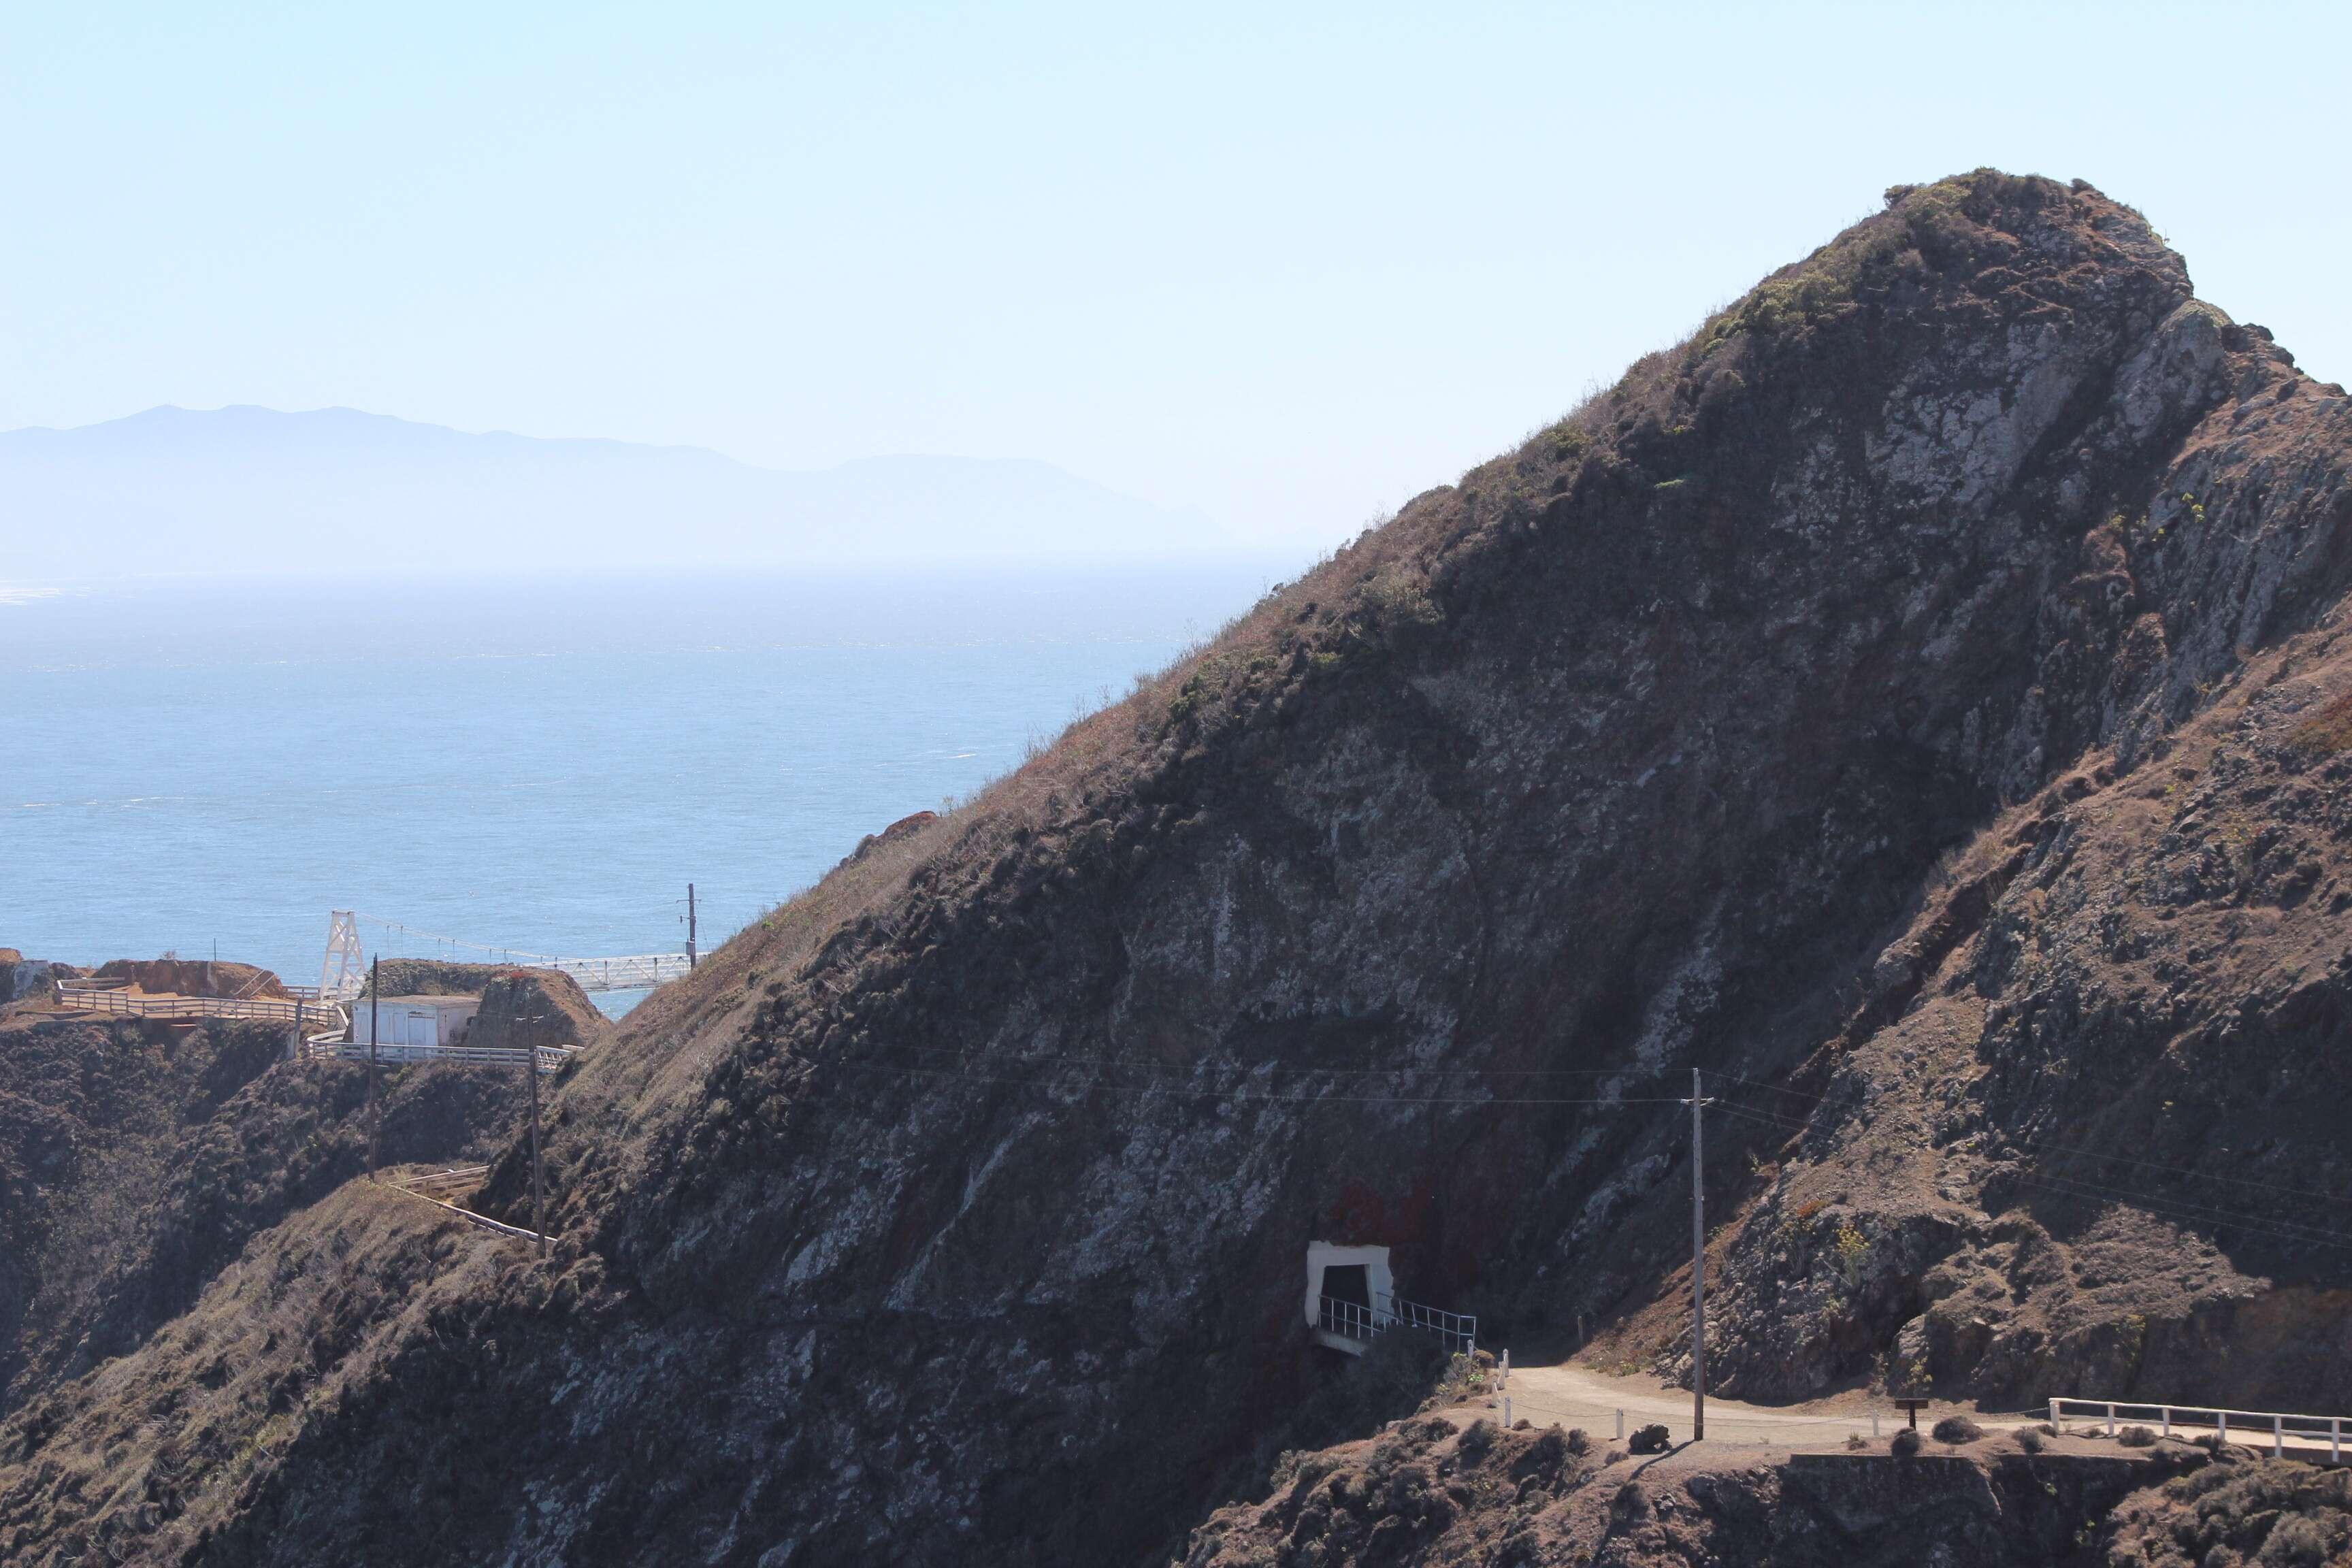 Caverna da Bonita Lighthouse - Marin Headlands